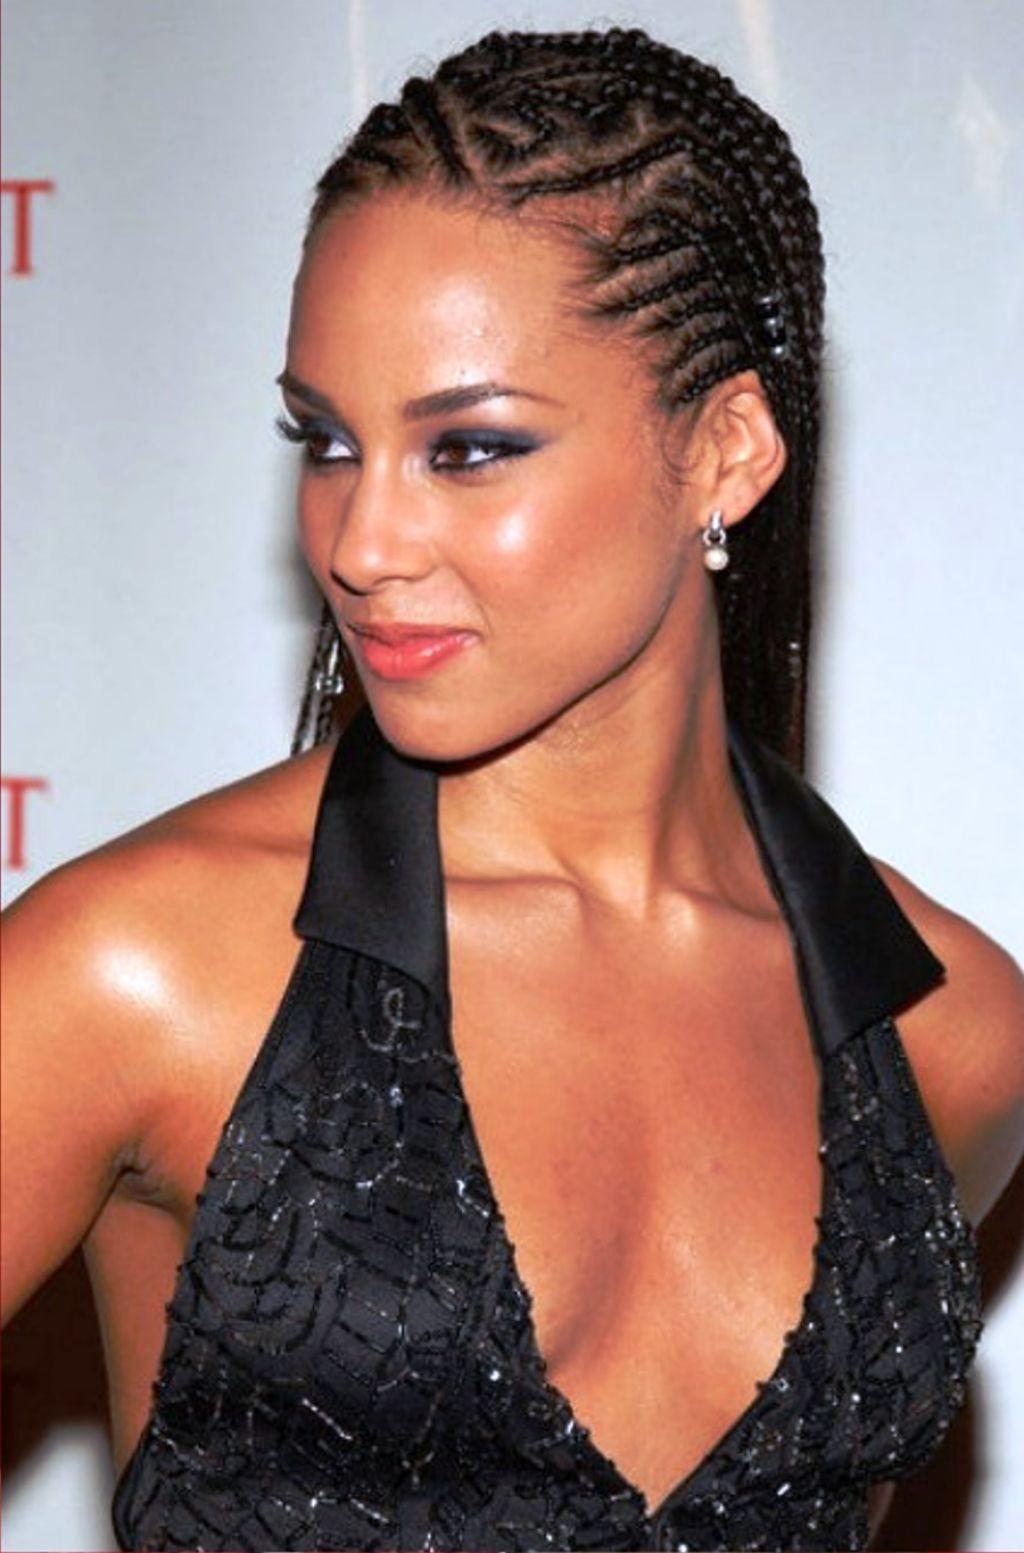 Astounding Alicia Keys Was Always My Hair Model When My Mom Braided My Hair Short Hairstyles Gunalazisus